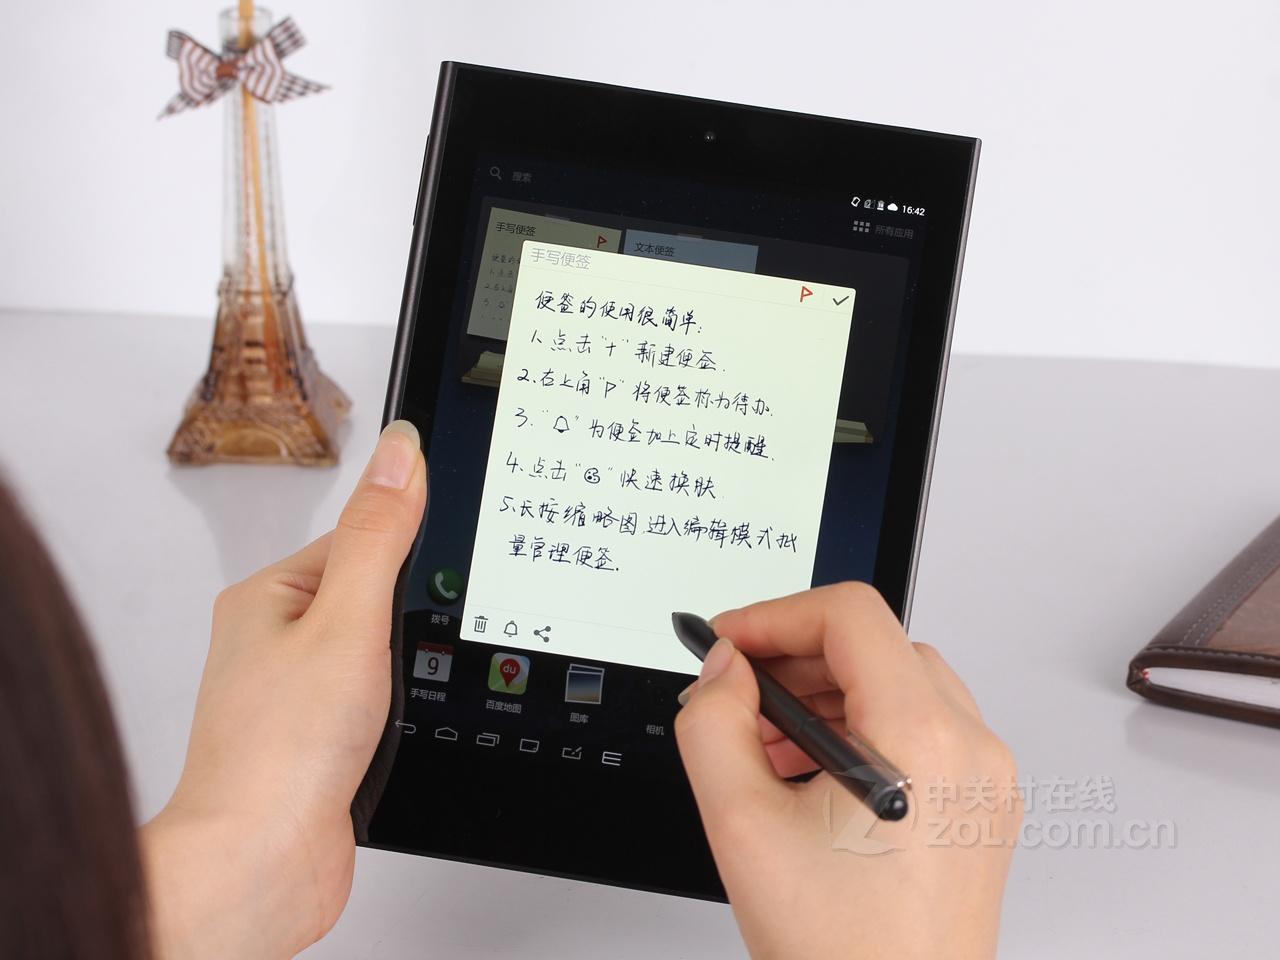 E人E本 T9 商务平板电脑 南宁大孚热售中